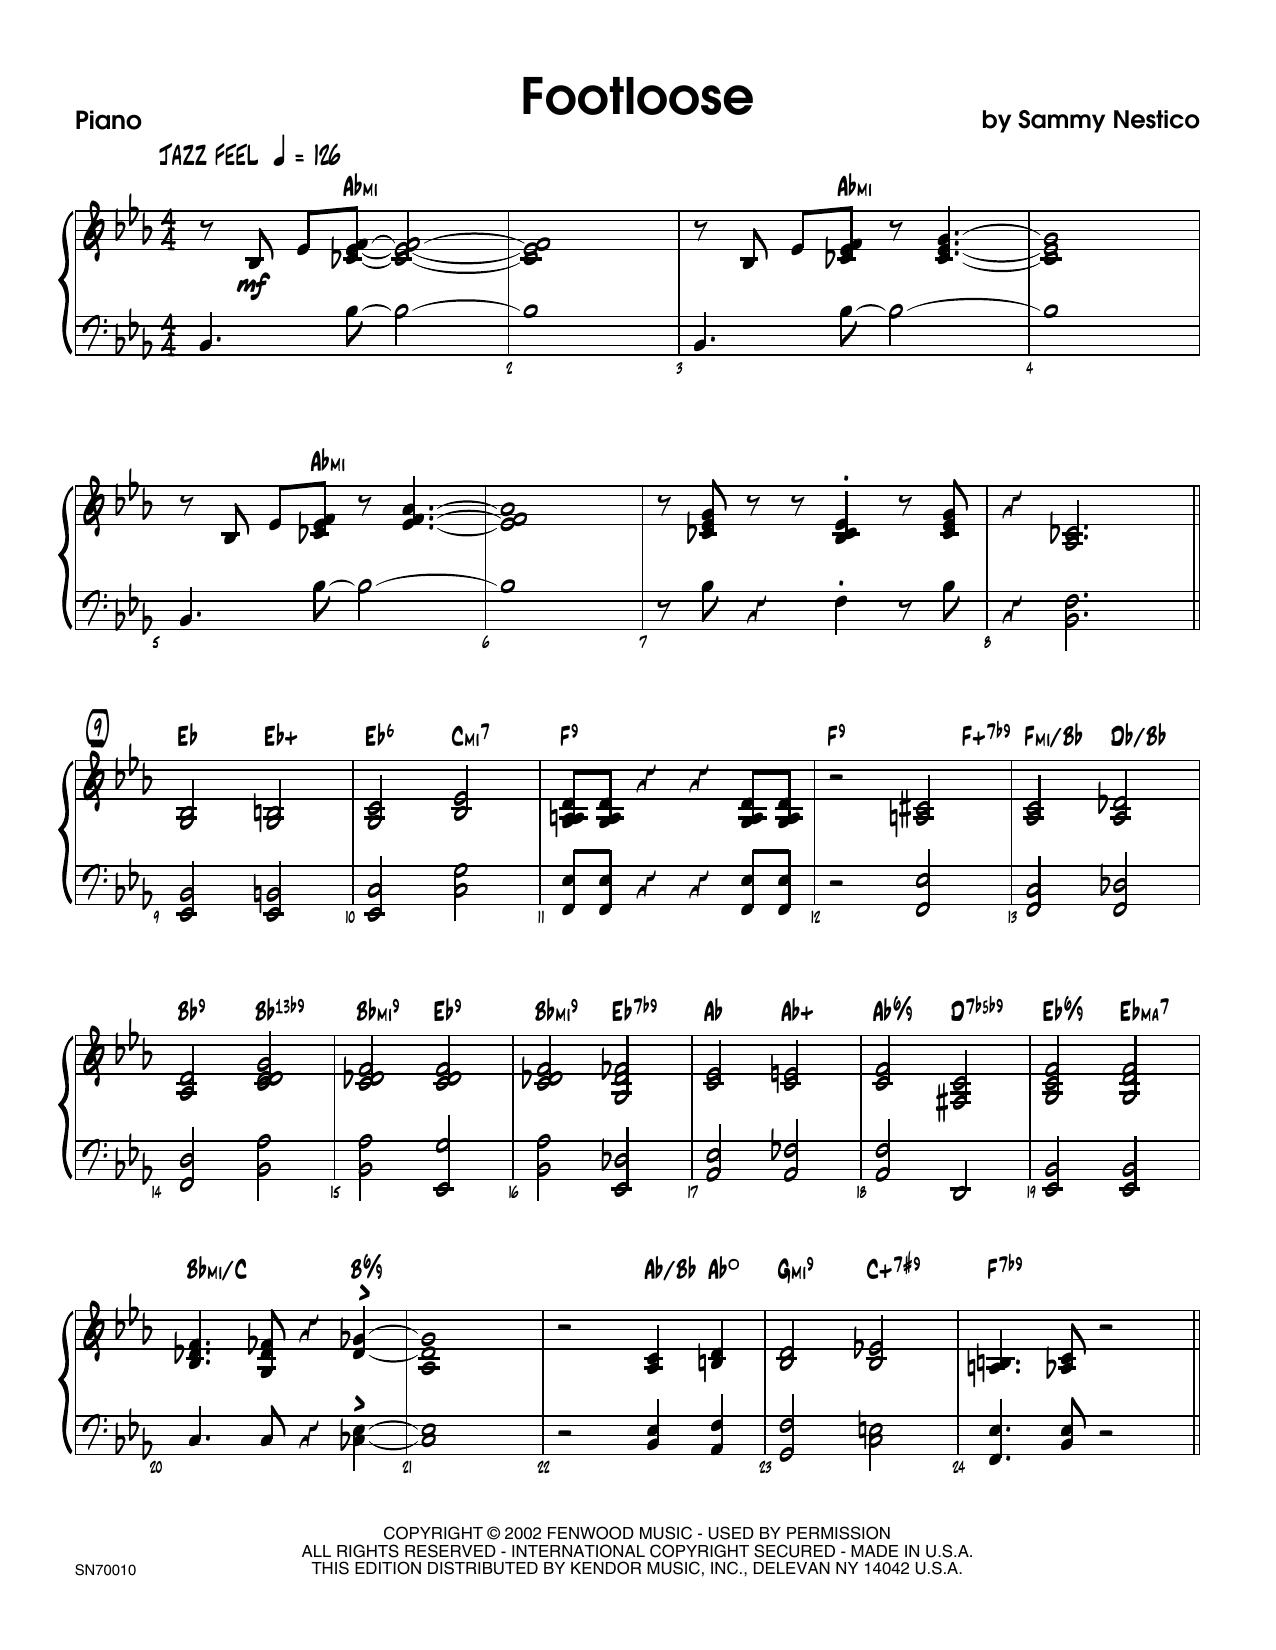 Footloose - Piano Sheet Music